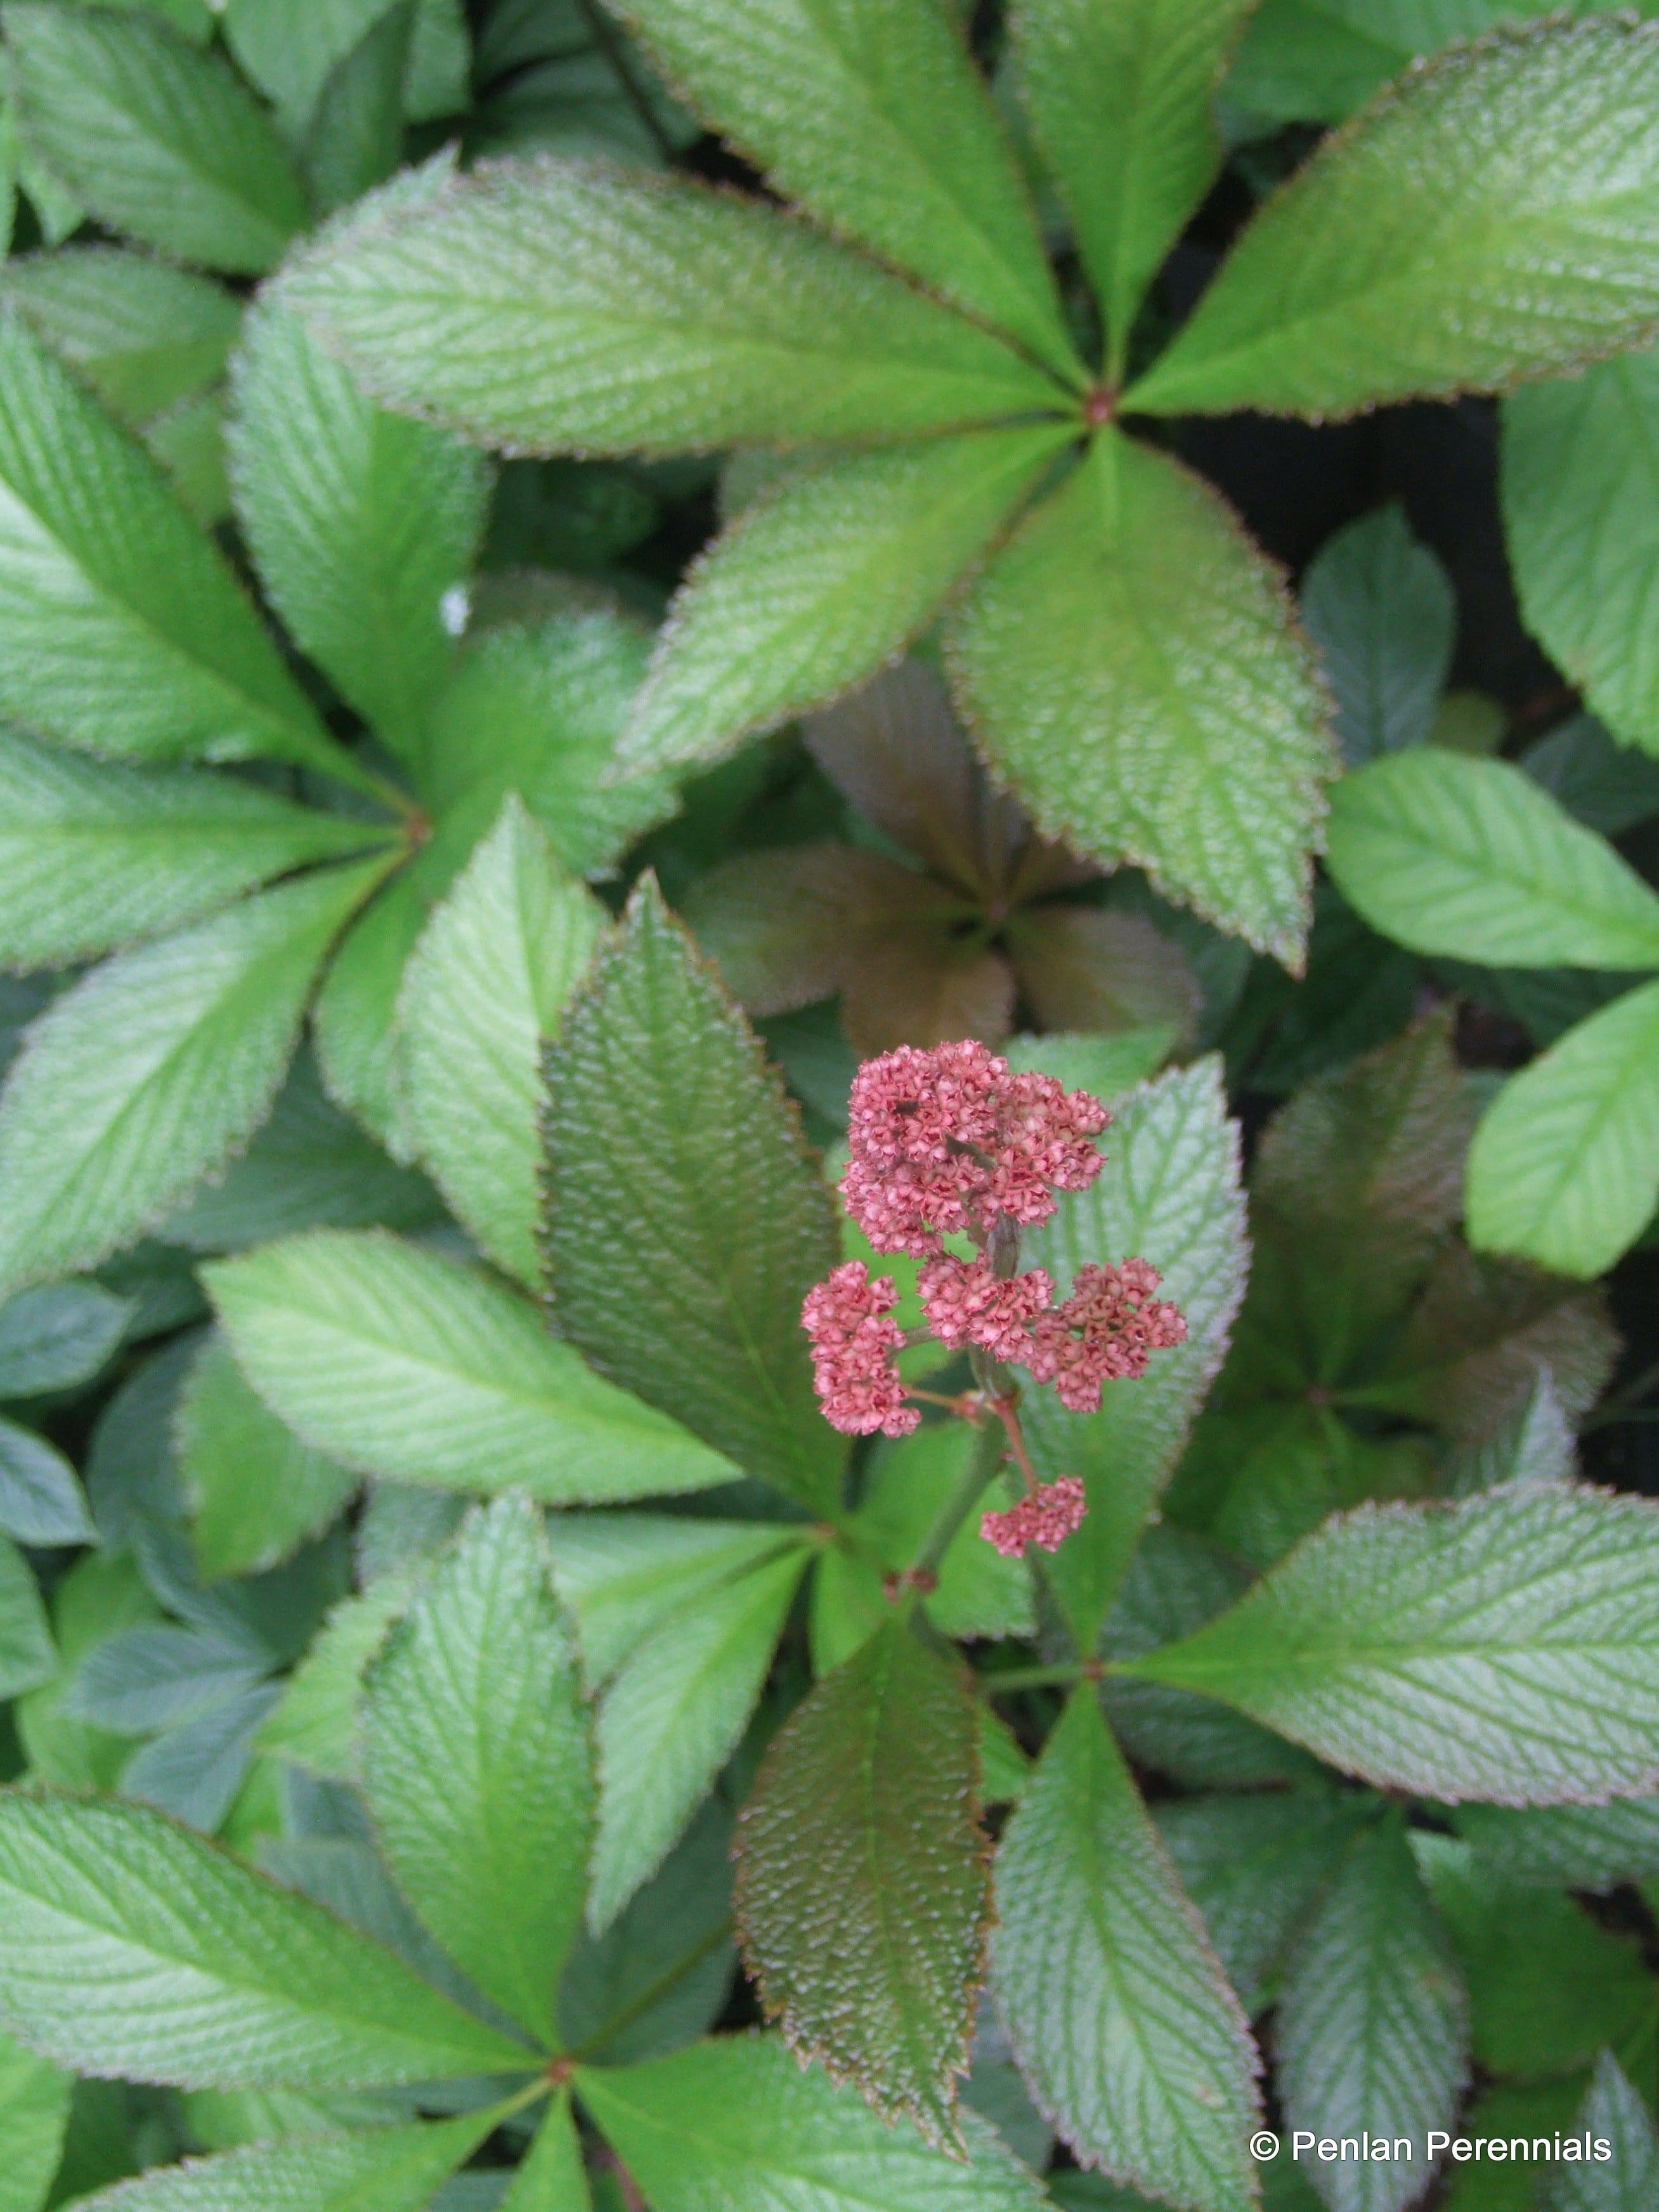 Penlan Perennials Nursery: Rodgersia Pinnata 'Superba'